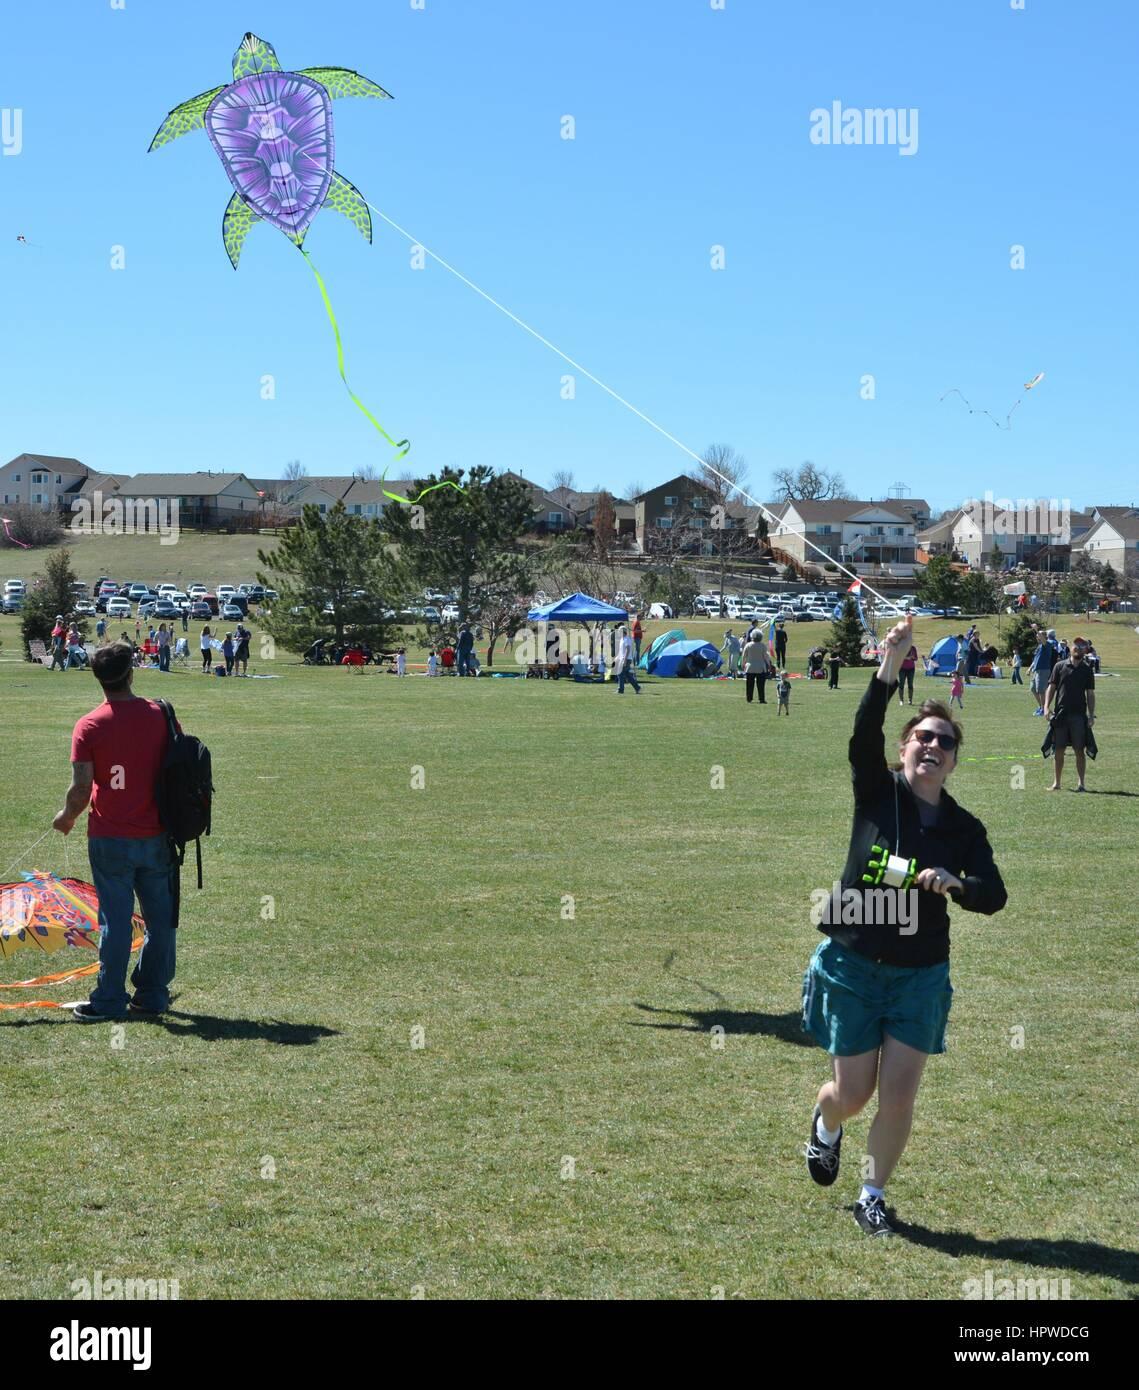 Unidentified People Flying Kites - Stock Image